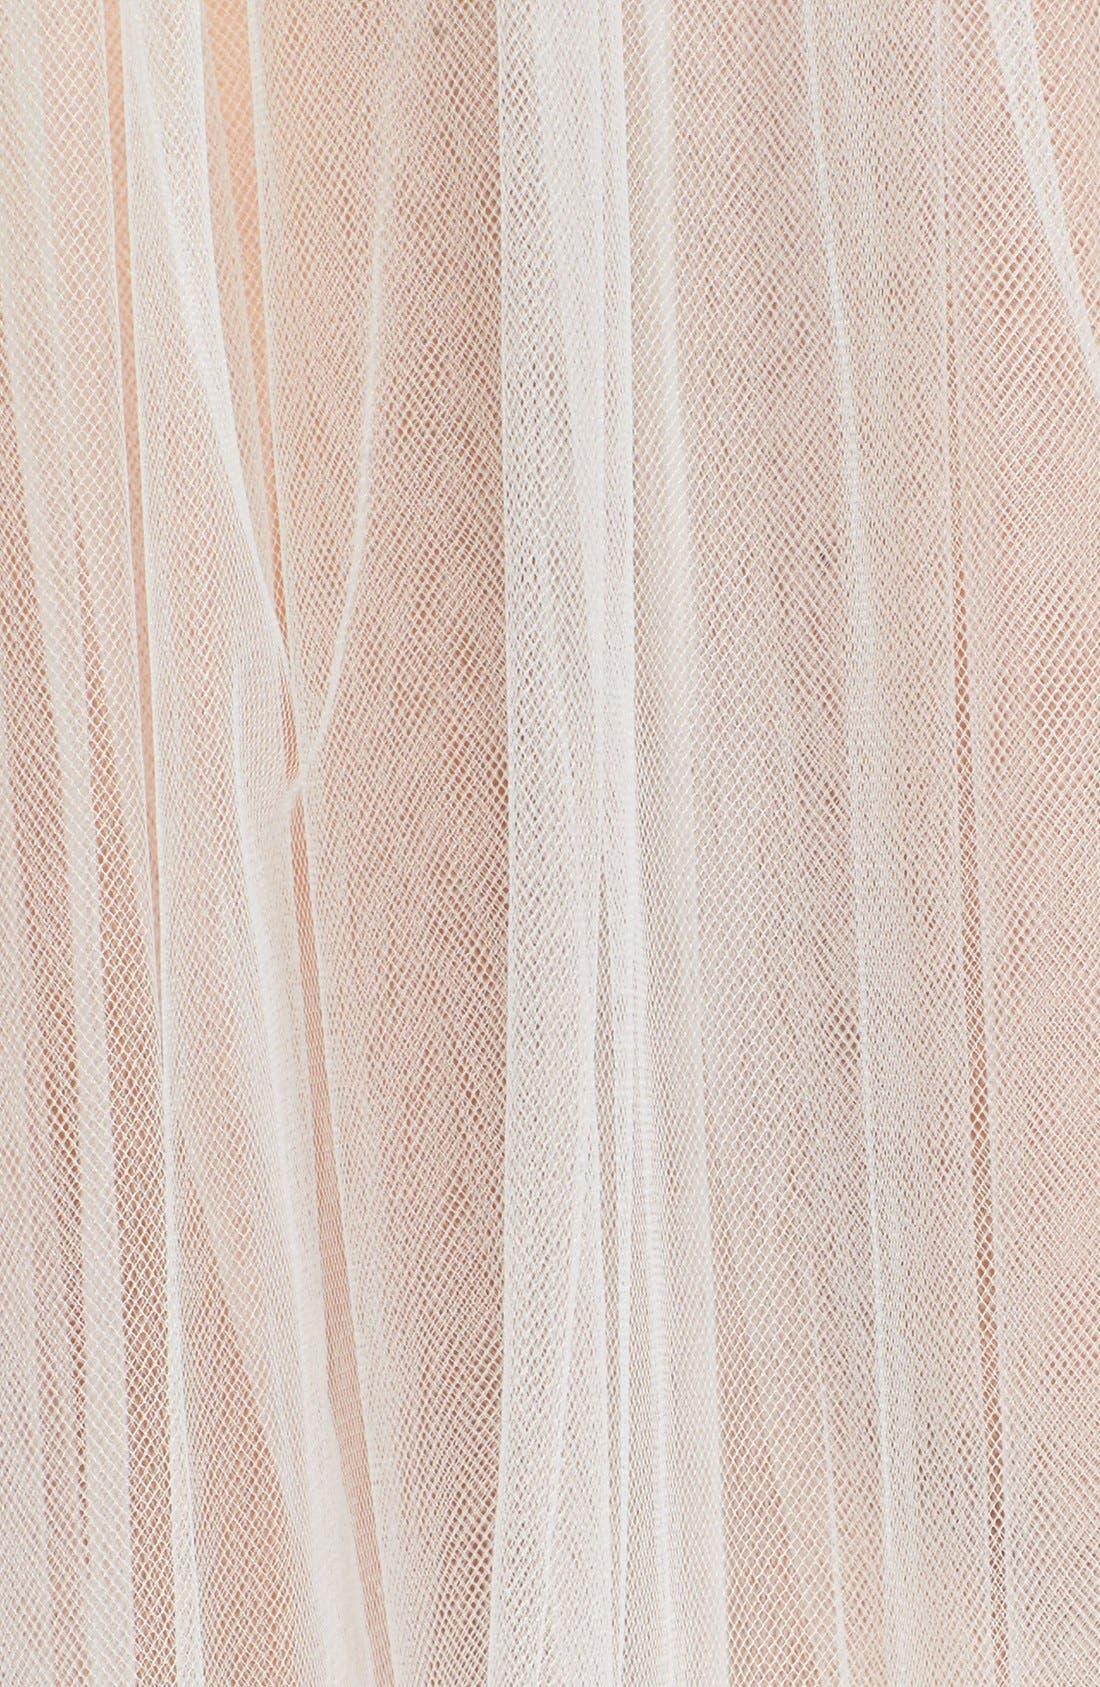 Alternate Image 4  - Toni Federici 'Sugar Pie' Embellished Hair Comb with Waltz Length Veil